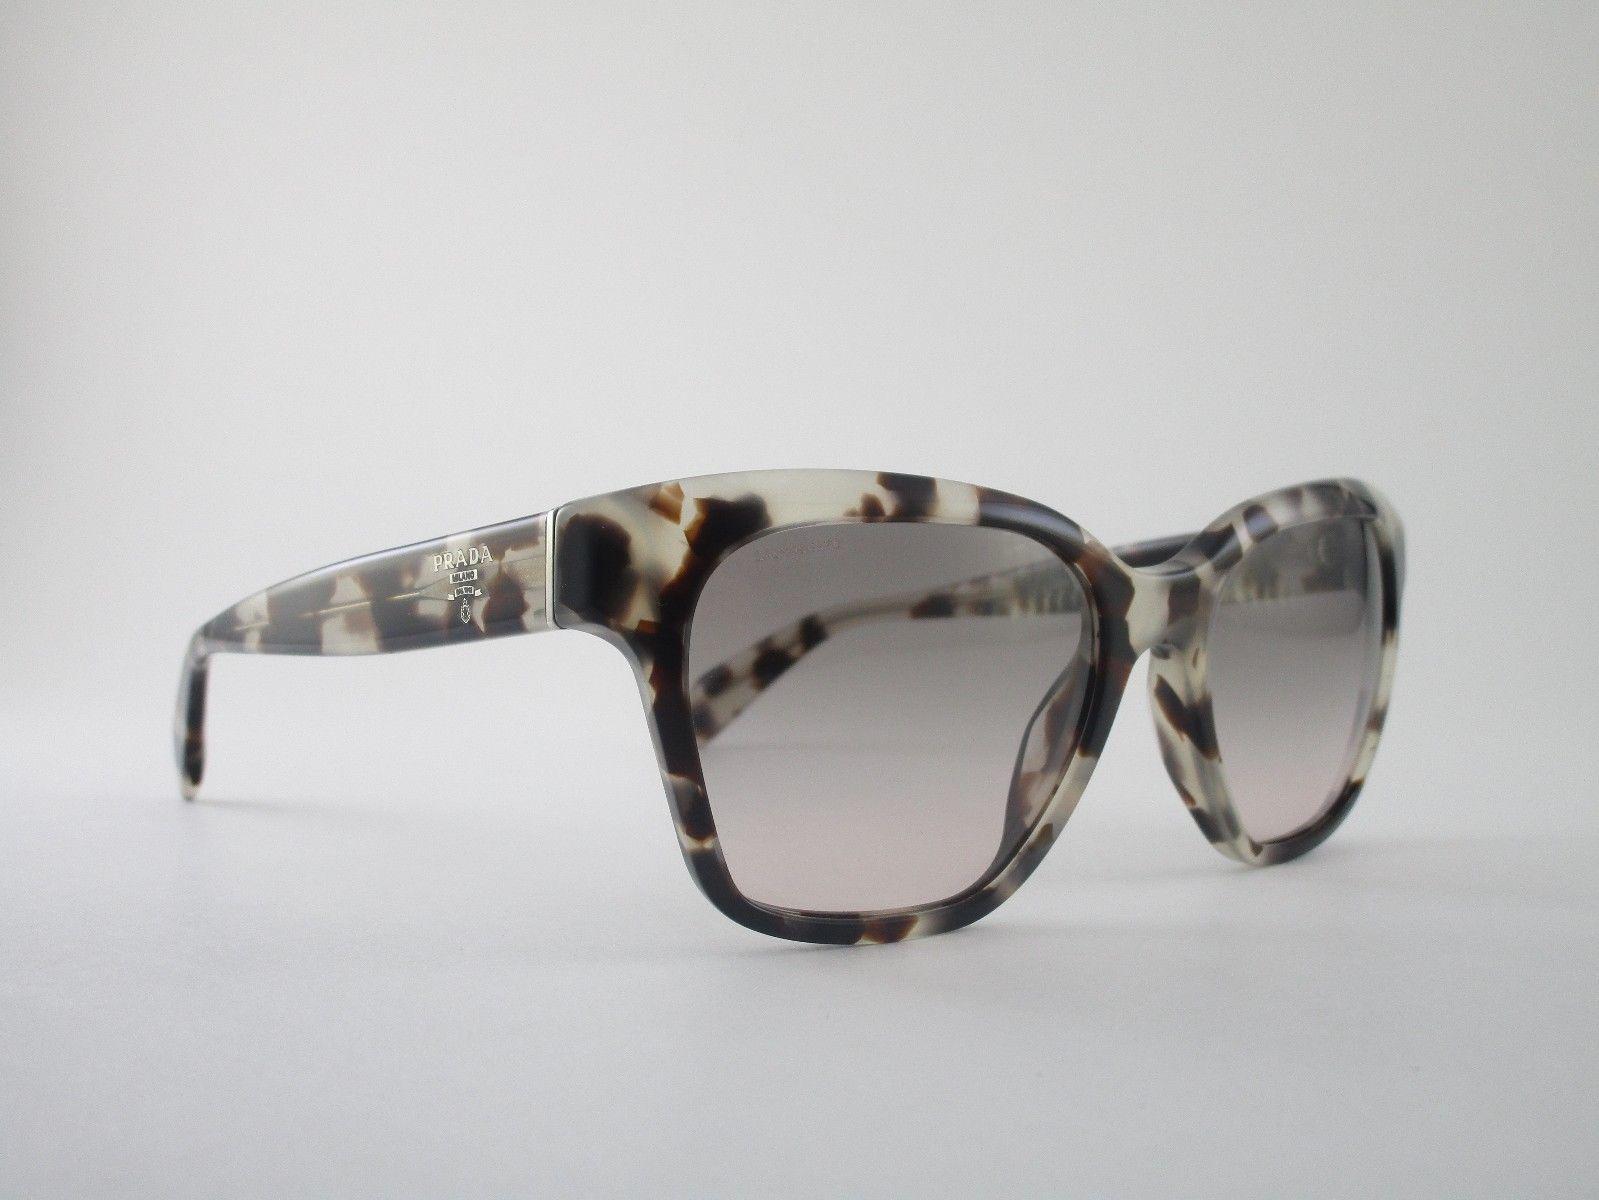 4b75ab8f3db31 ... gradient 14f8e bb696  discount prada spr 29r 2au 3do sunglasses havana  gray cateye eyewear ce39b 141d4